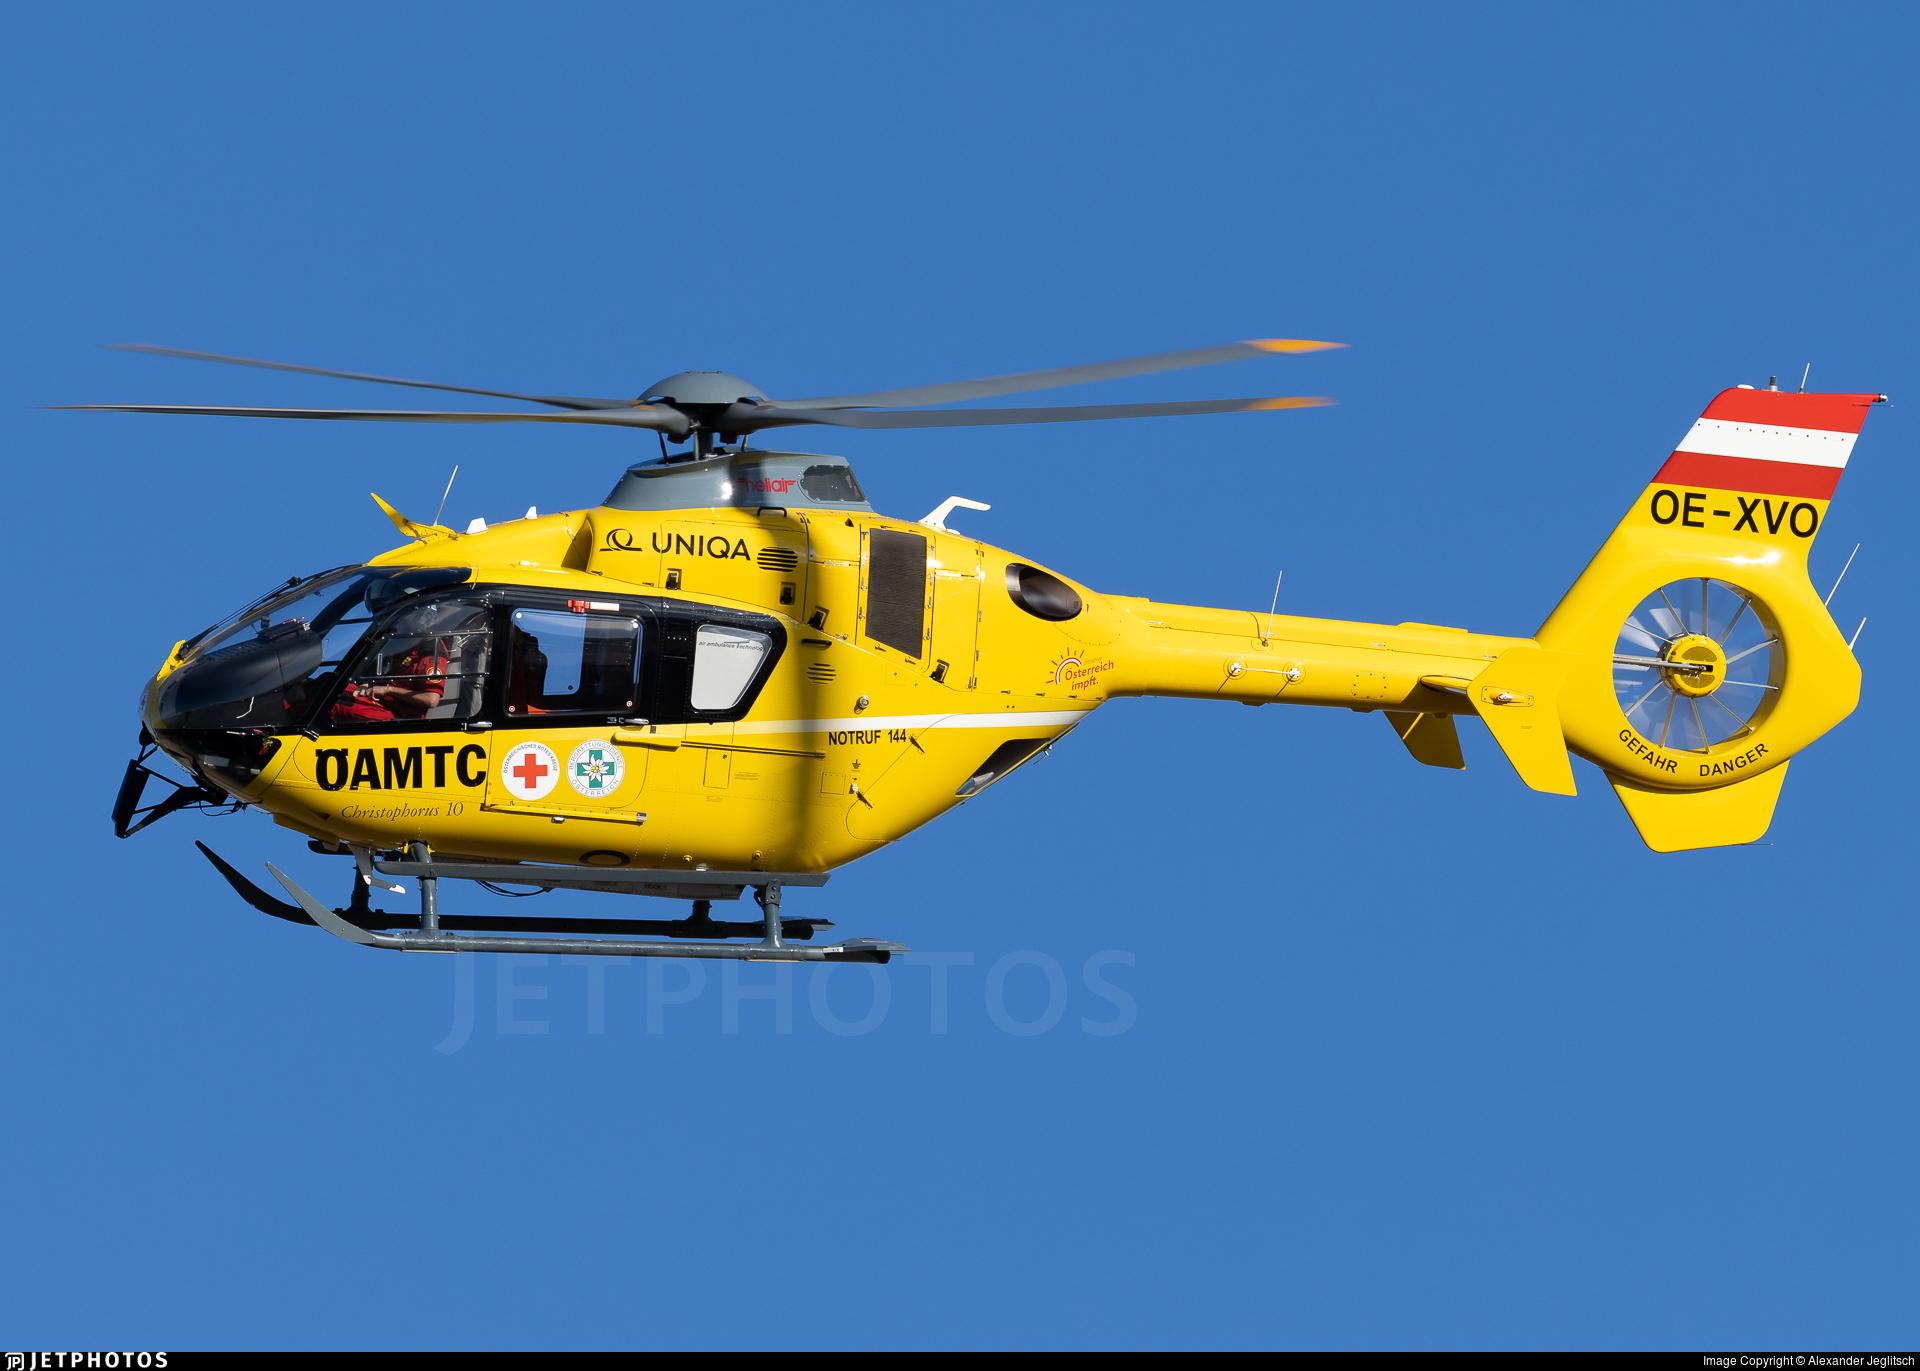 OE-XVO - Eurocopter EC 135T2 - Christophorus Flugrettungsverein (ÖAMTC)